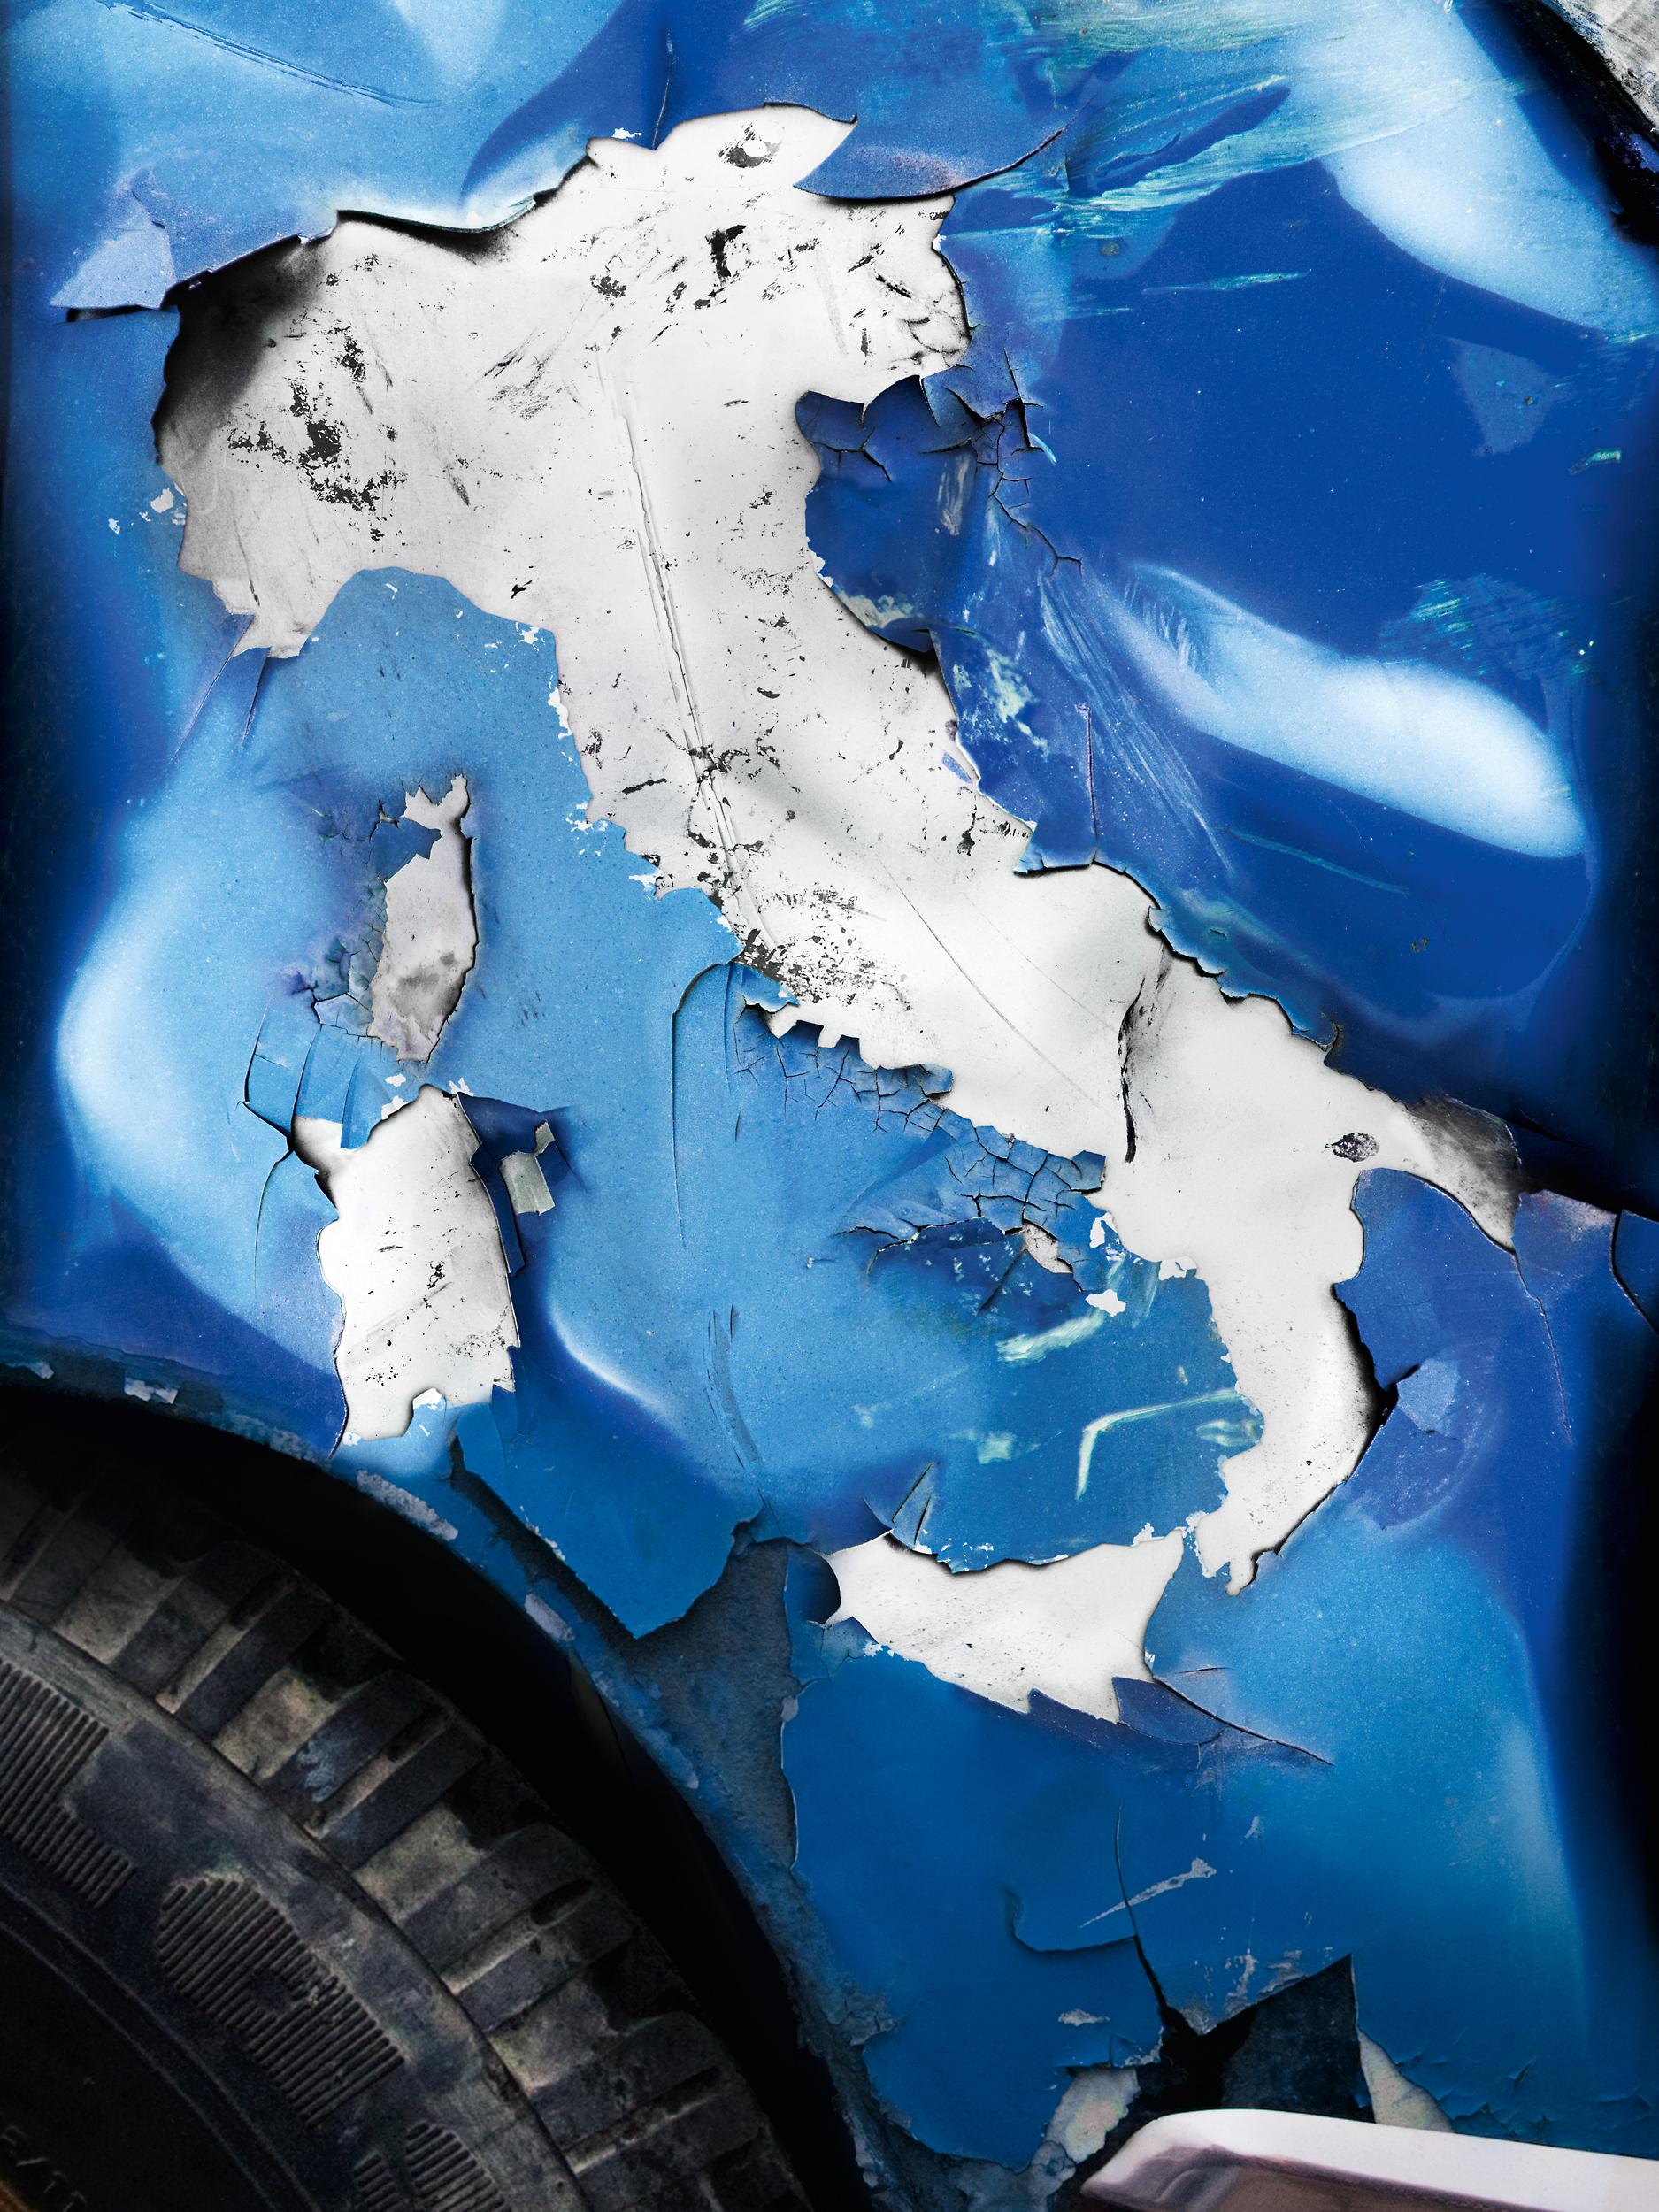 Blaupapier Bildretusche Allianz Auslandsvericherung Lack Italien